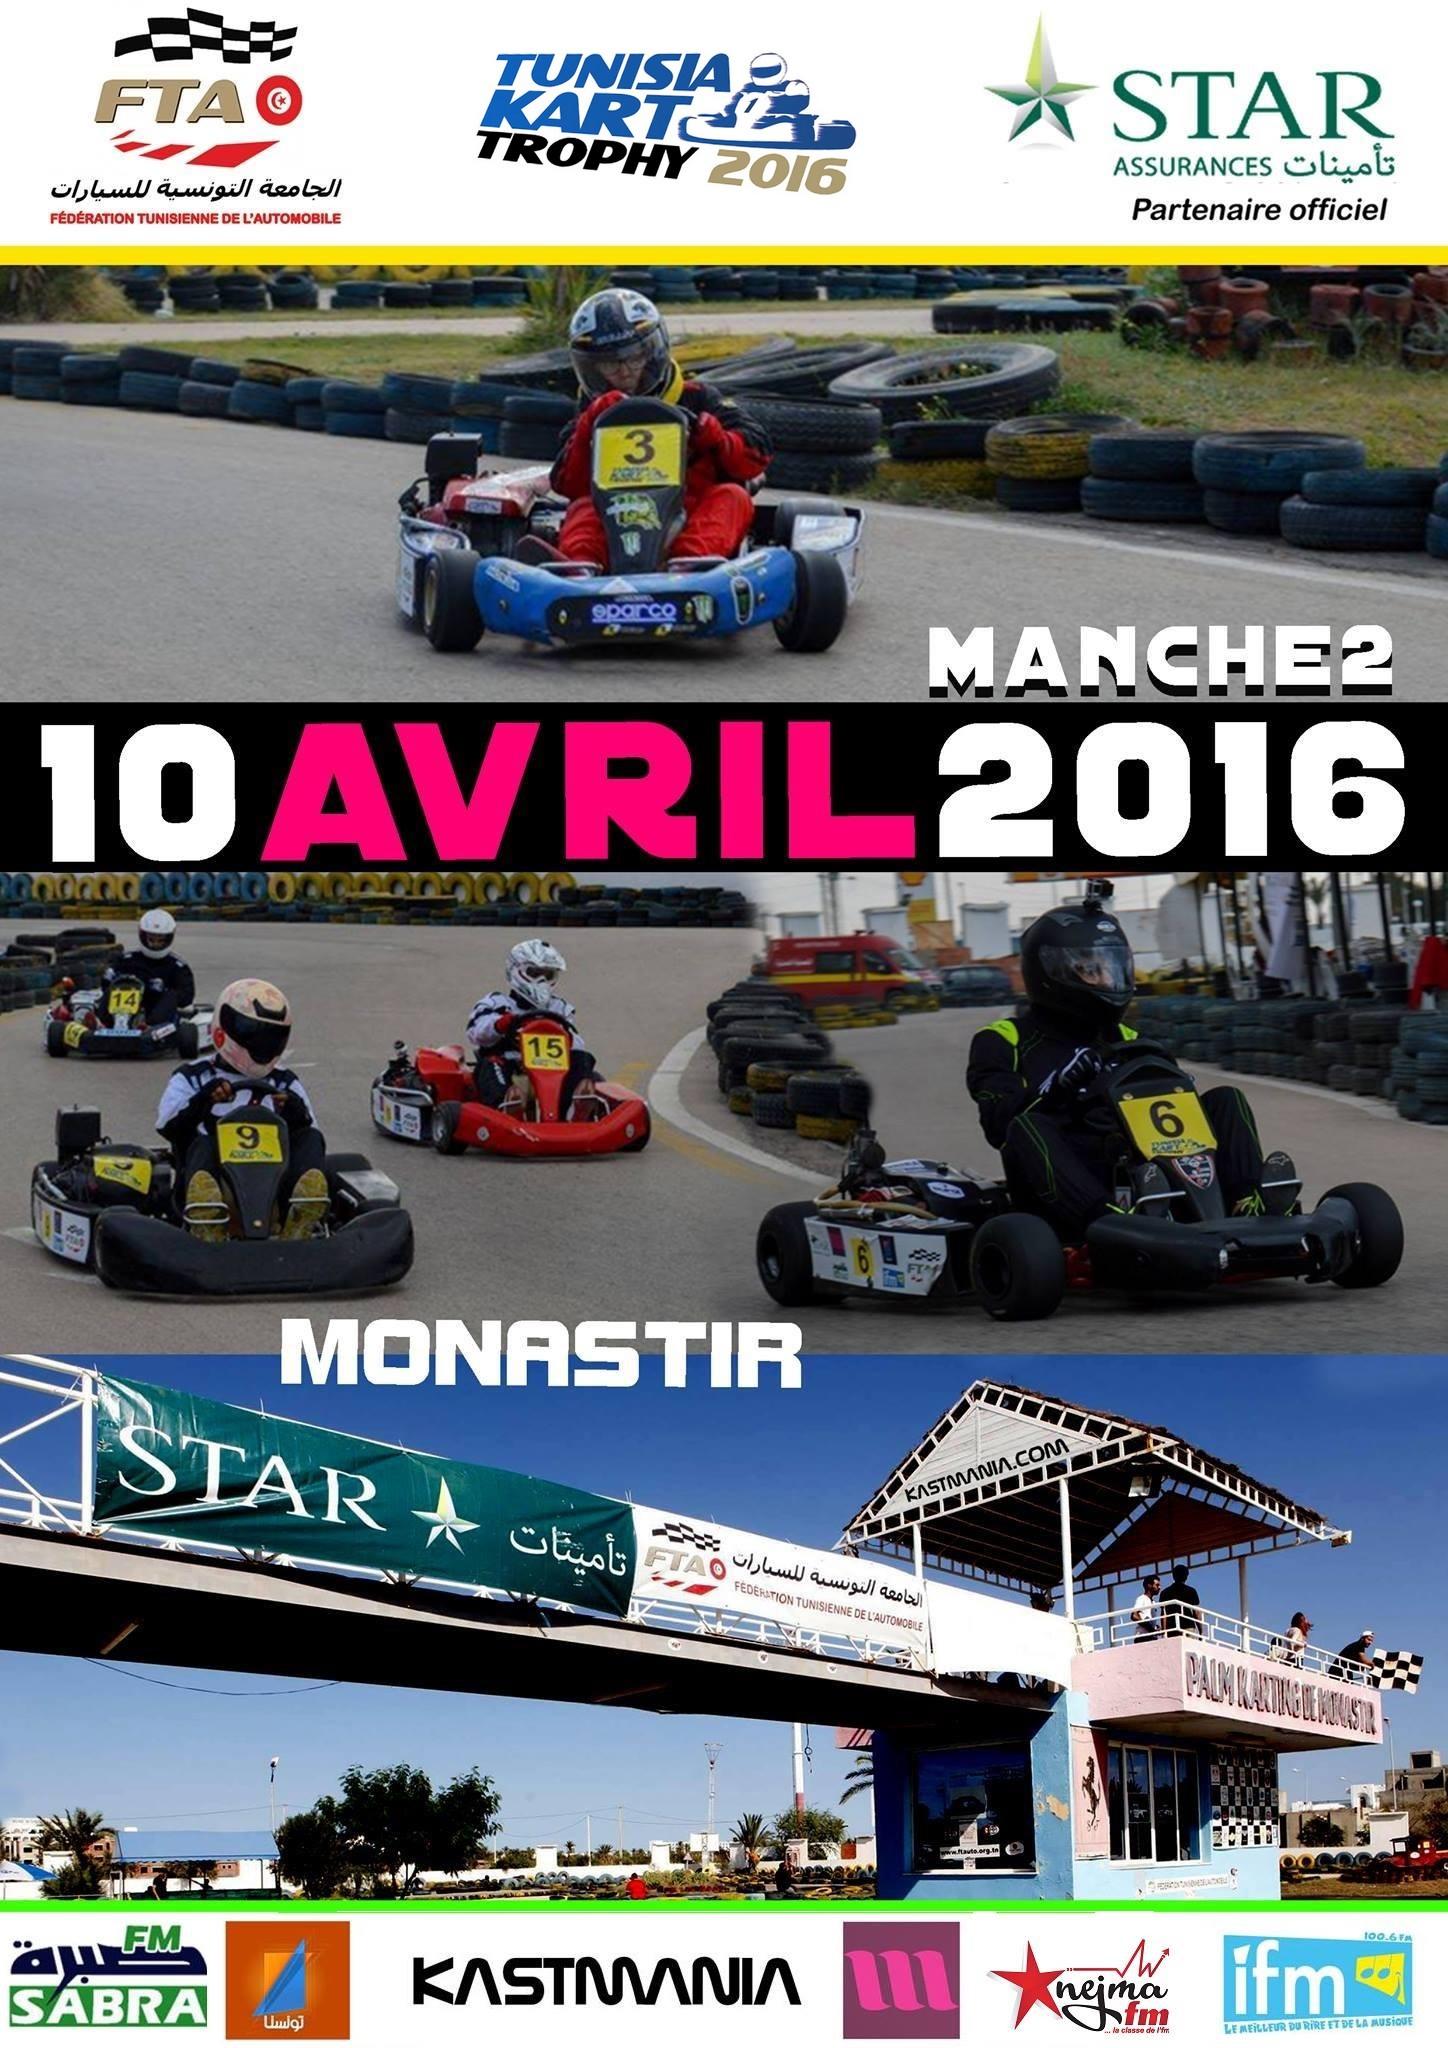 Manche 2 – Tunisia Kart Trophy 2016